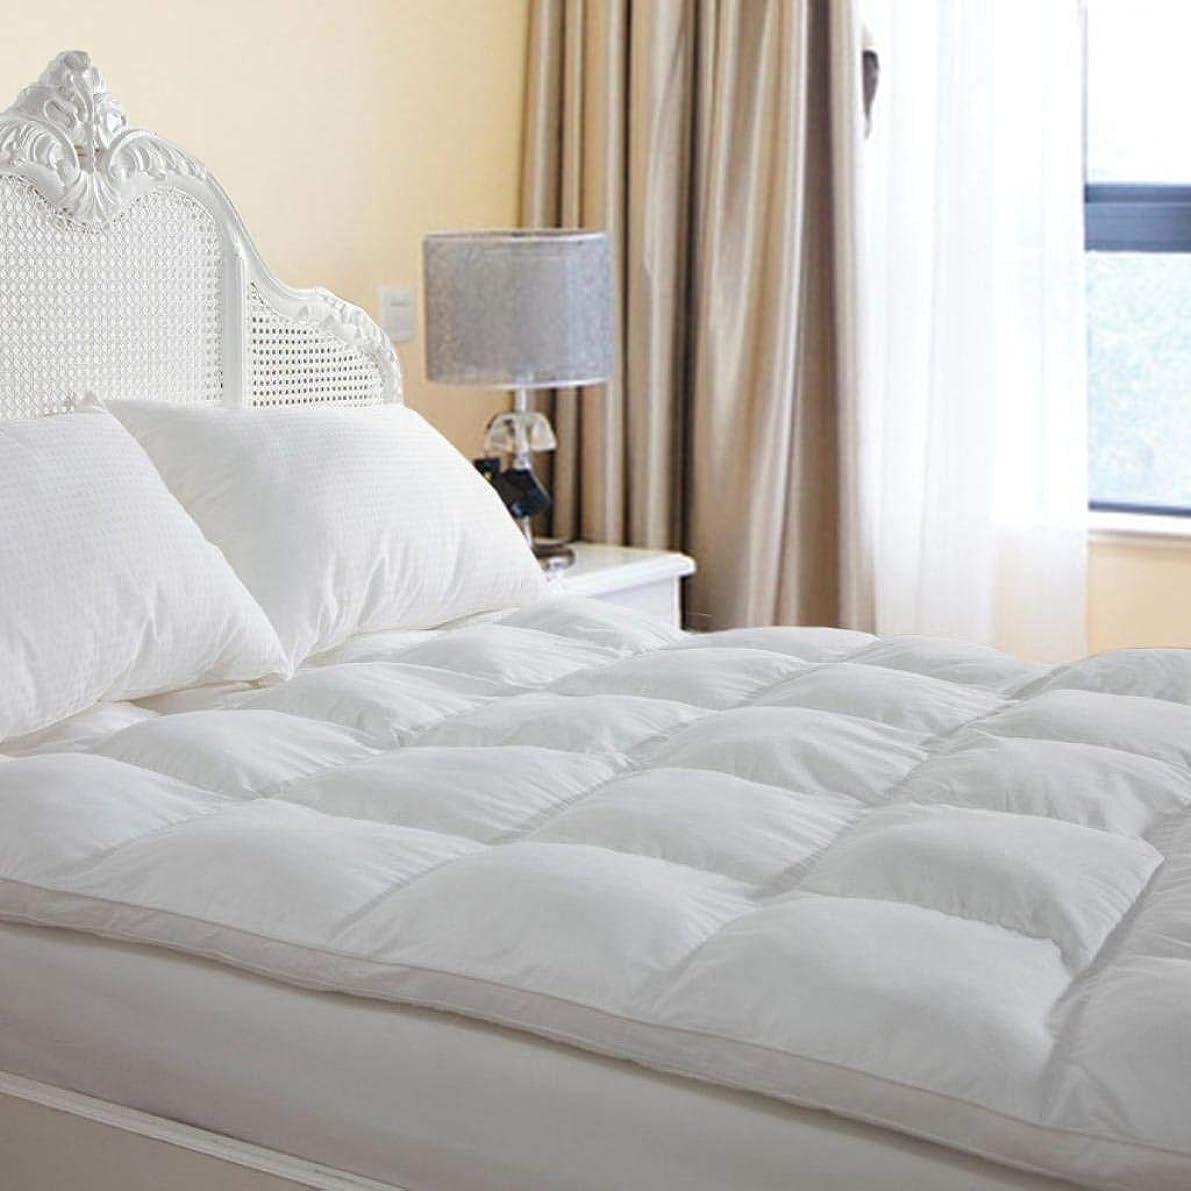 Duck & Goose Co Plush Durable Premium Hotel Quality Mattress Topper, Hypoallergenic Down Alternative Fiber with 10-Year Warranty, Queen Size, 2